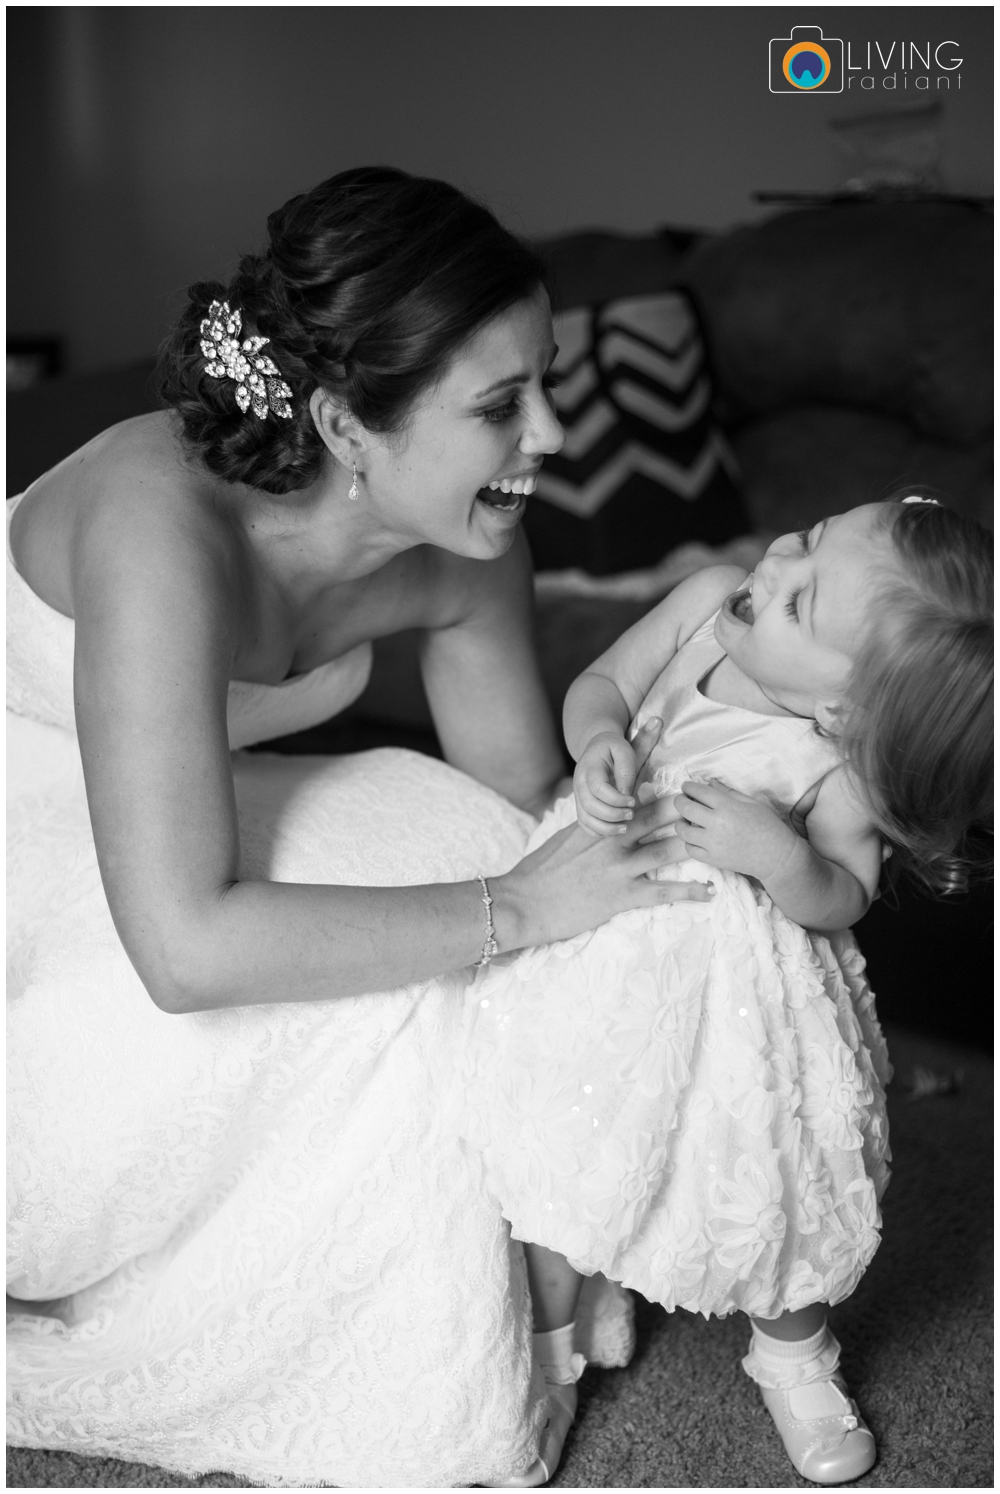 shannon-bill-bowers-wedding-living-radiant-photography-union-mills-homestead_0010.jpg